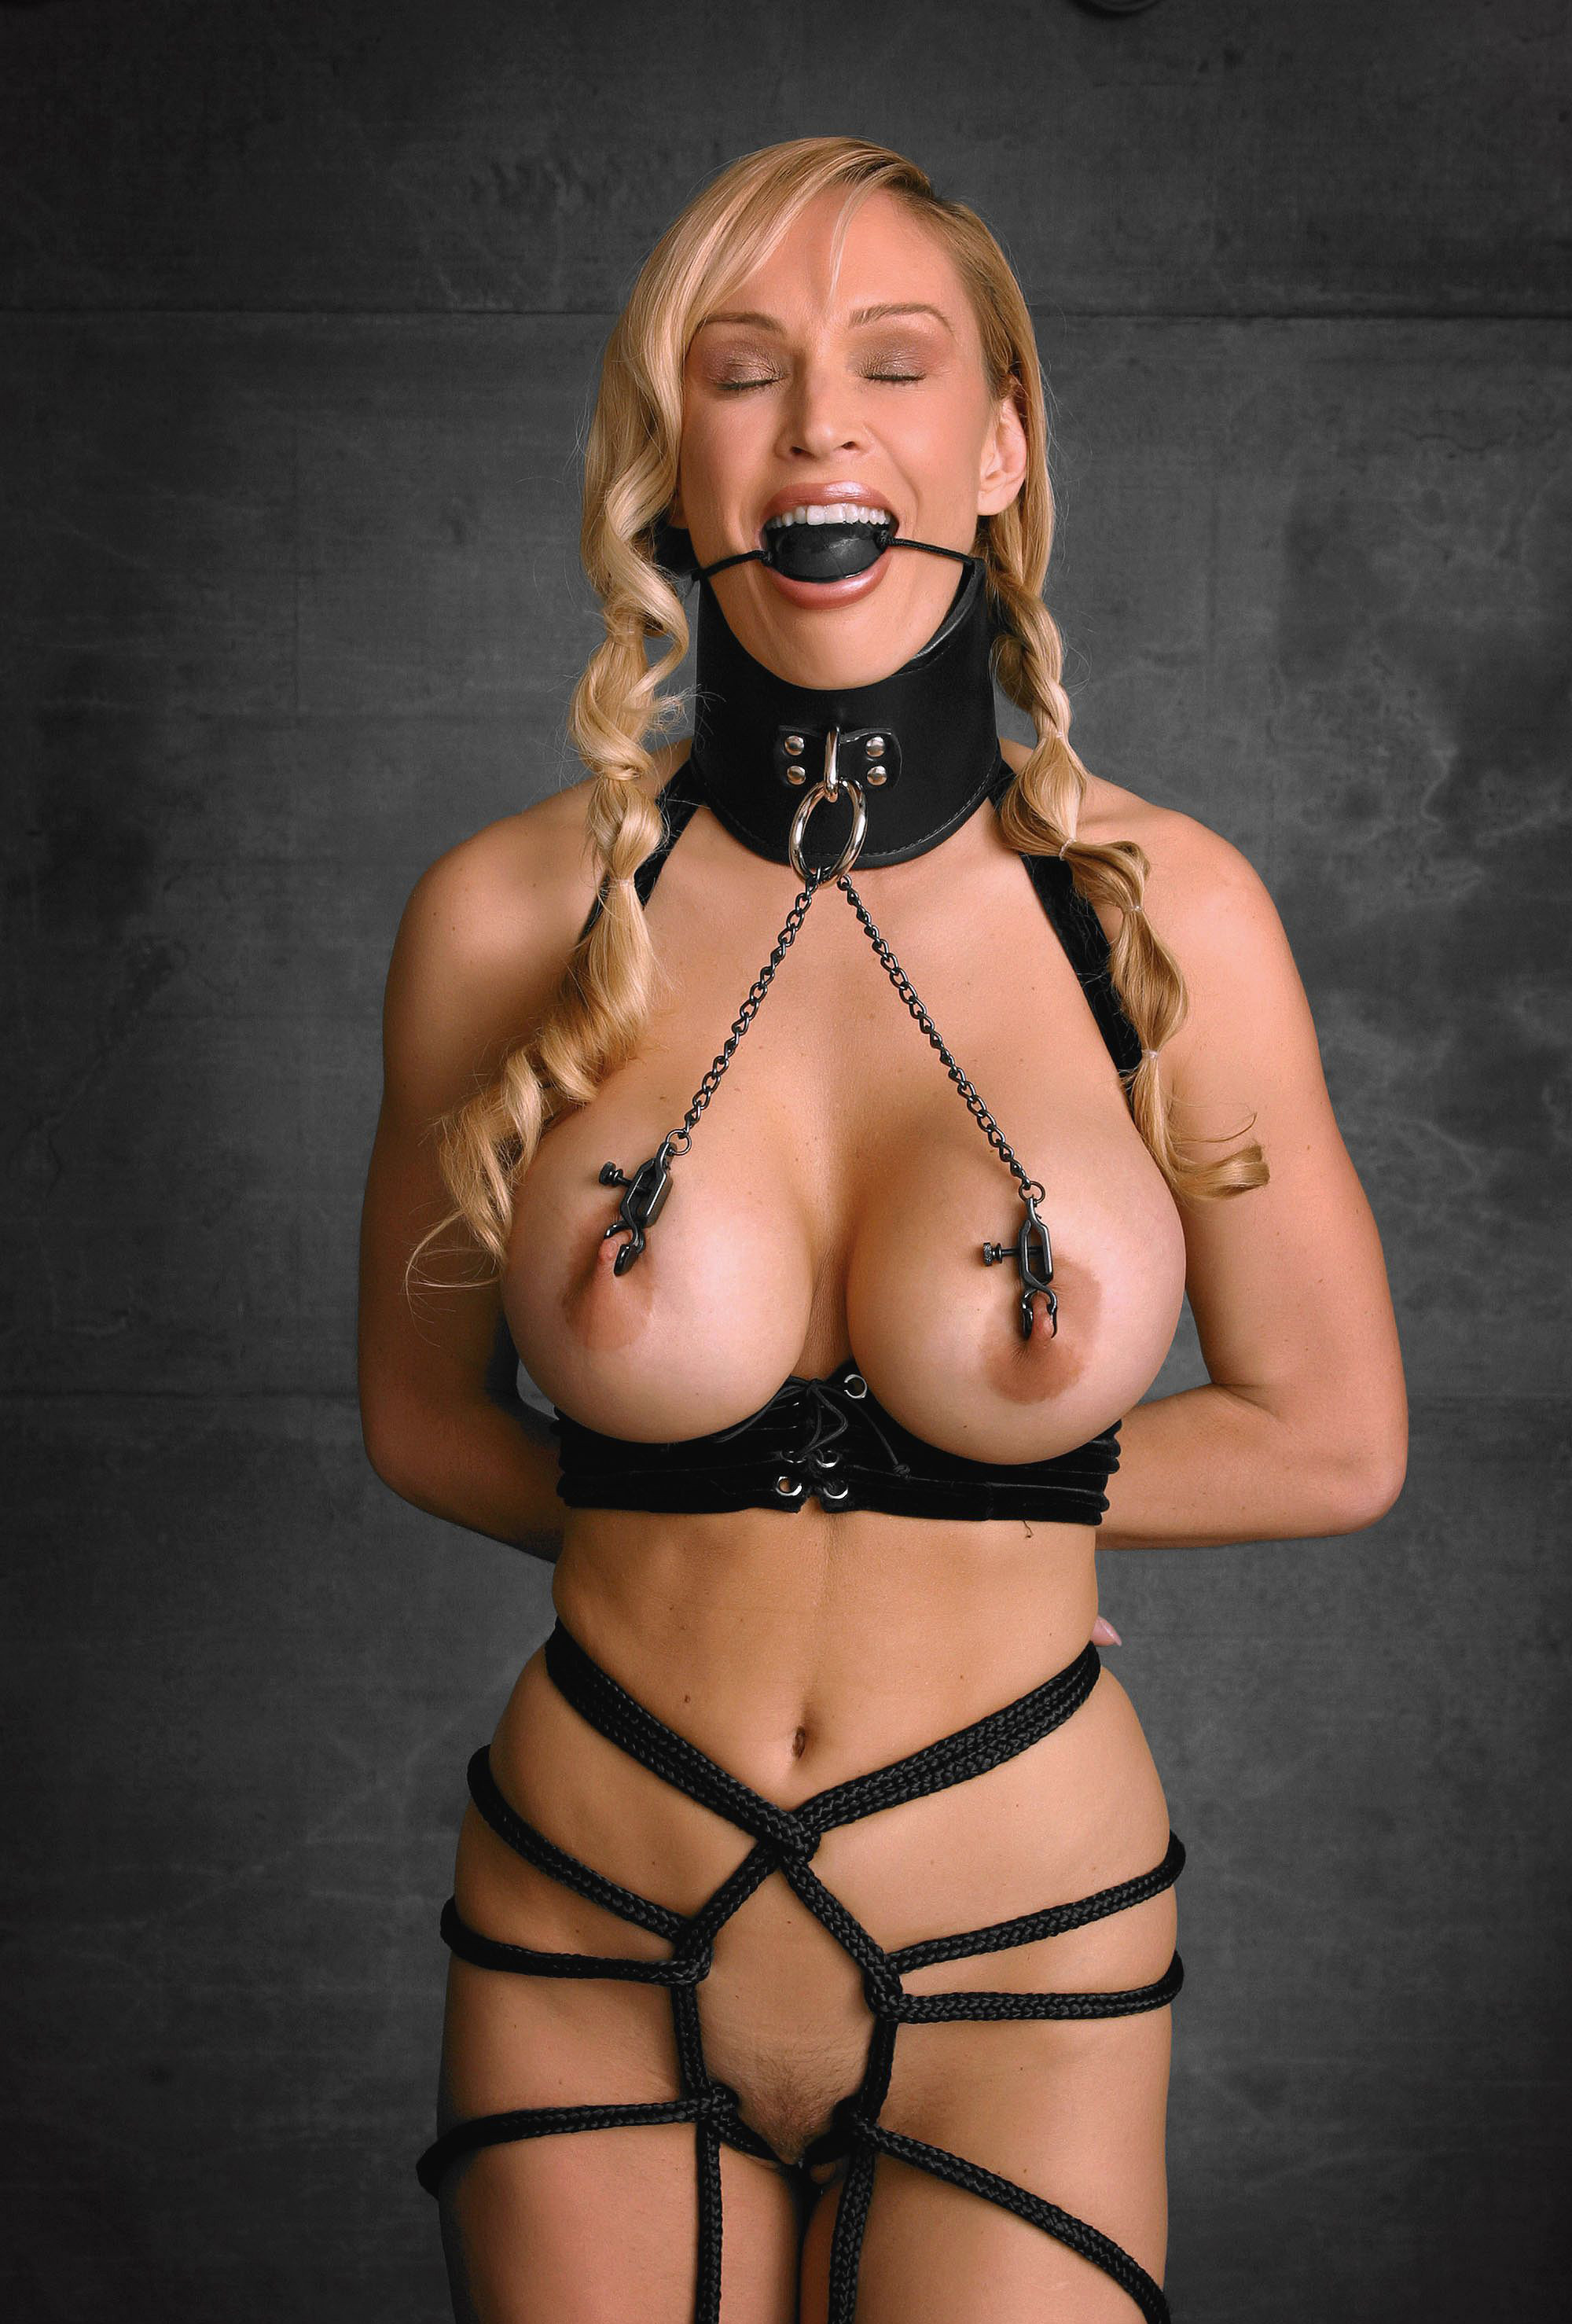 Erotic and stimulating breast bondage with neck collar